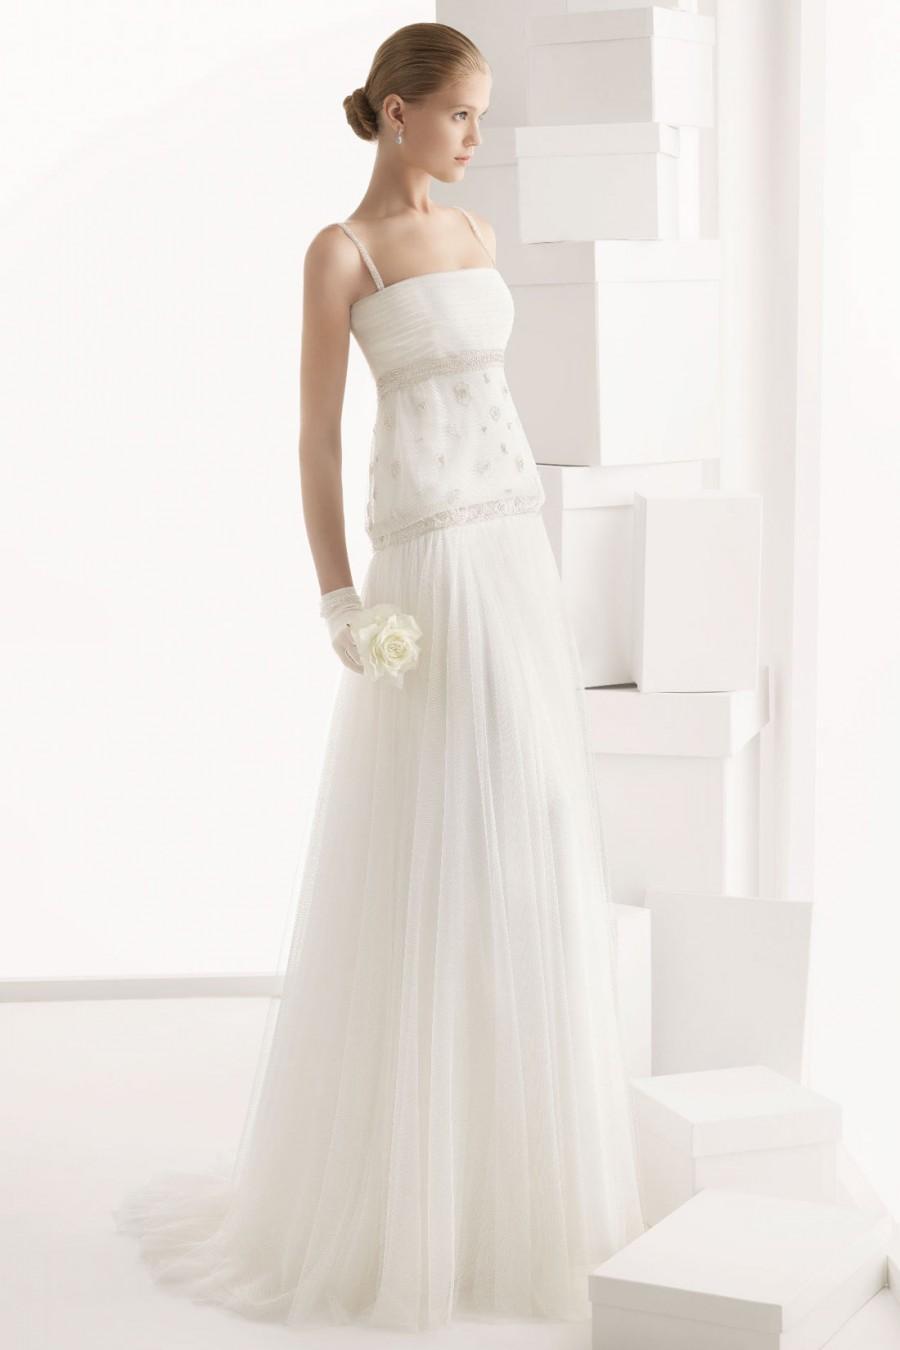 Wedding - Modern Spaghetti Straps Appliques Floor Length Cheap Wedding Dress